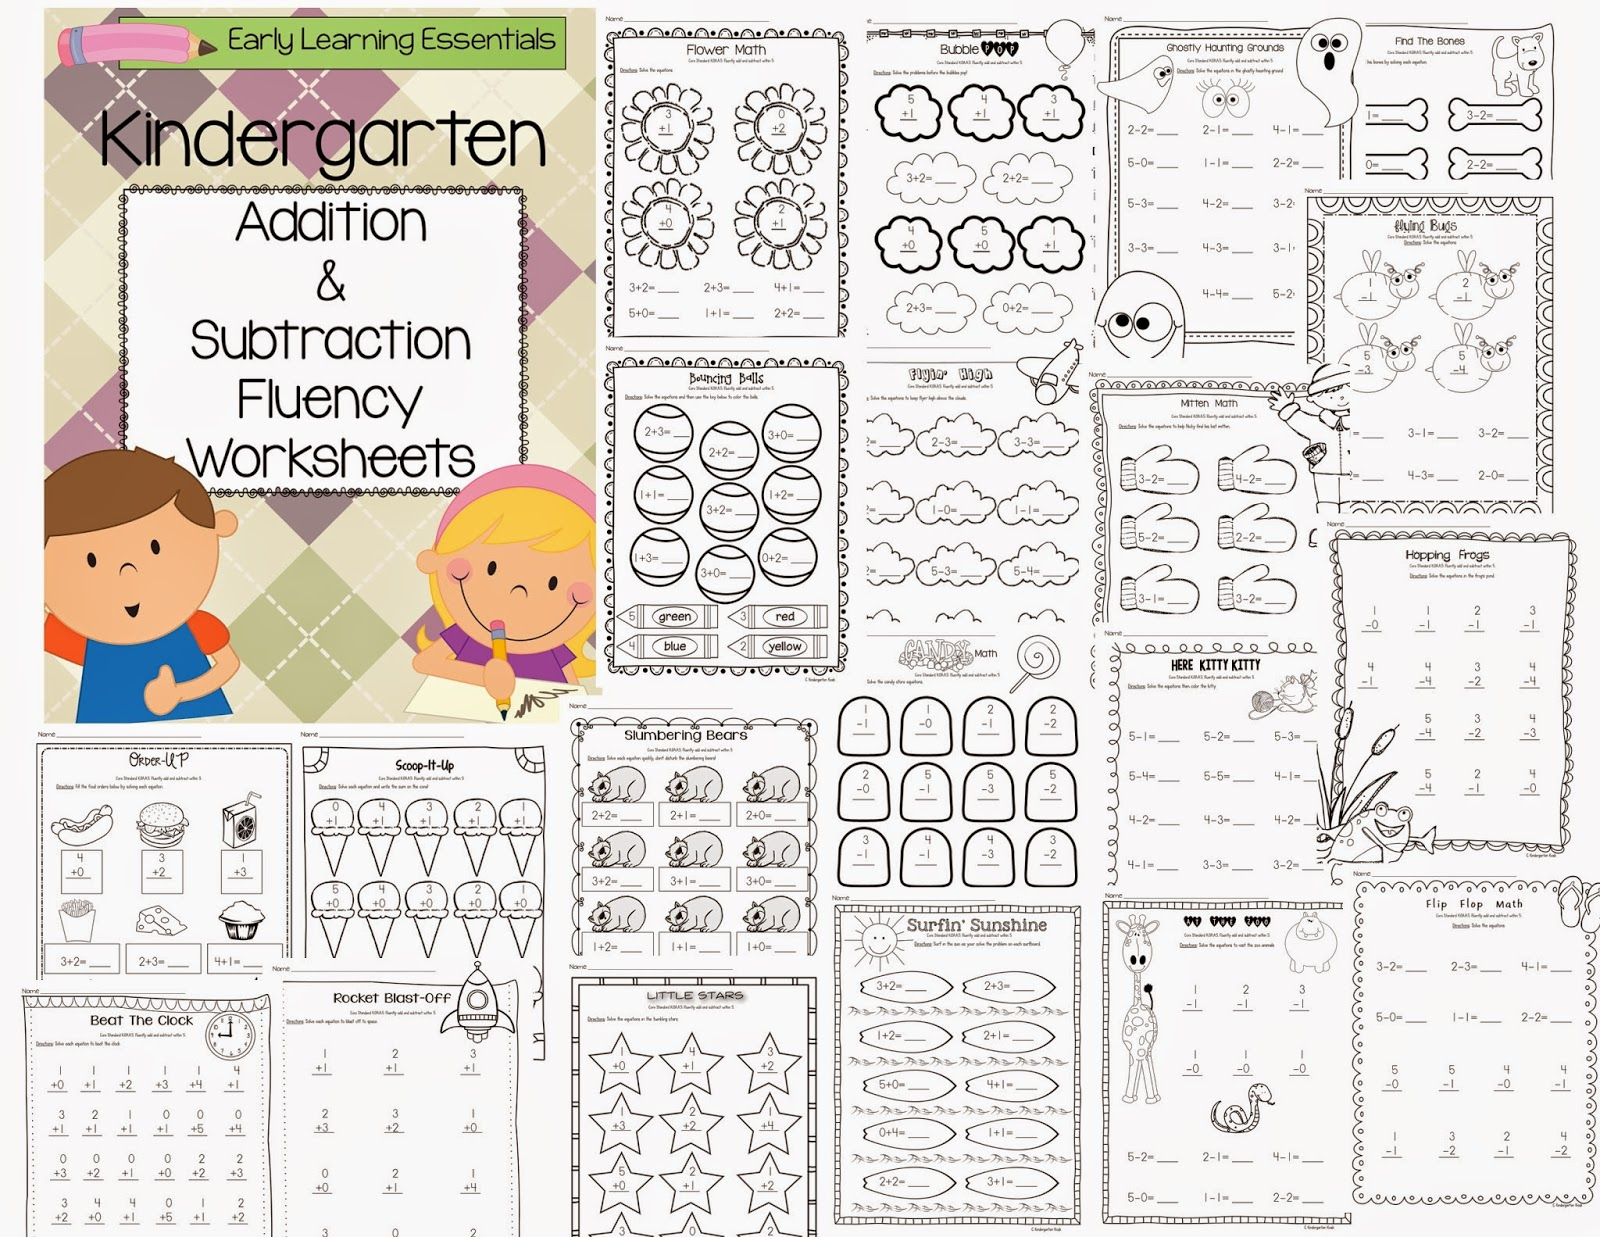 Kindergarten Kiosk Addition And Subtraction Kindergarten